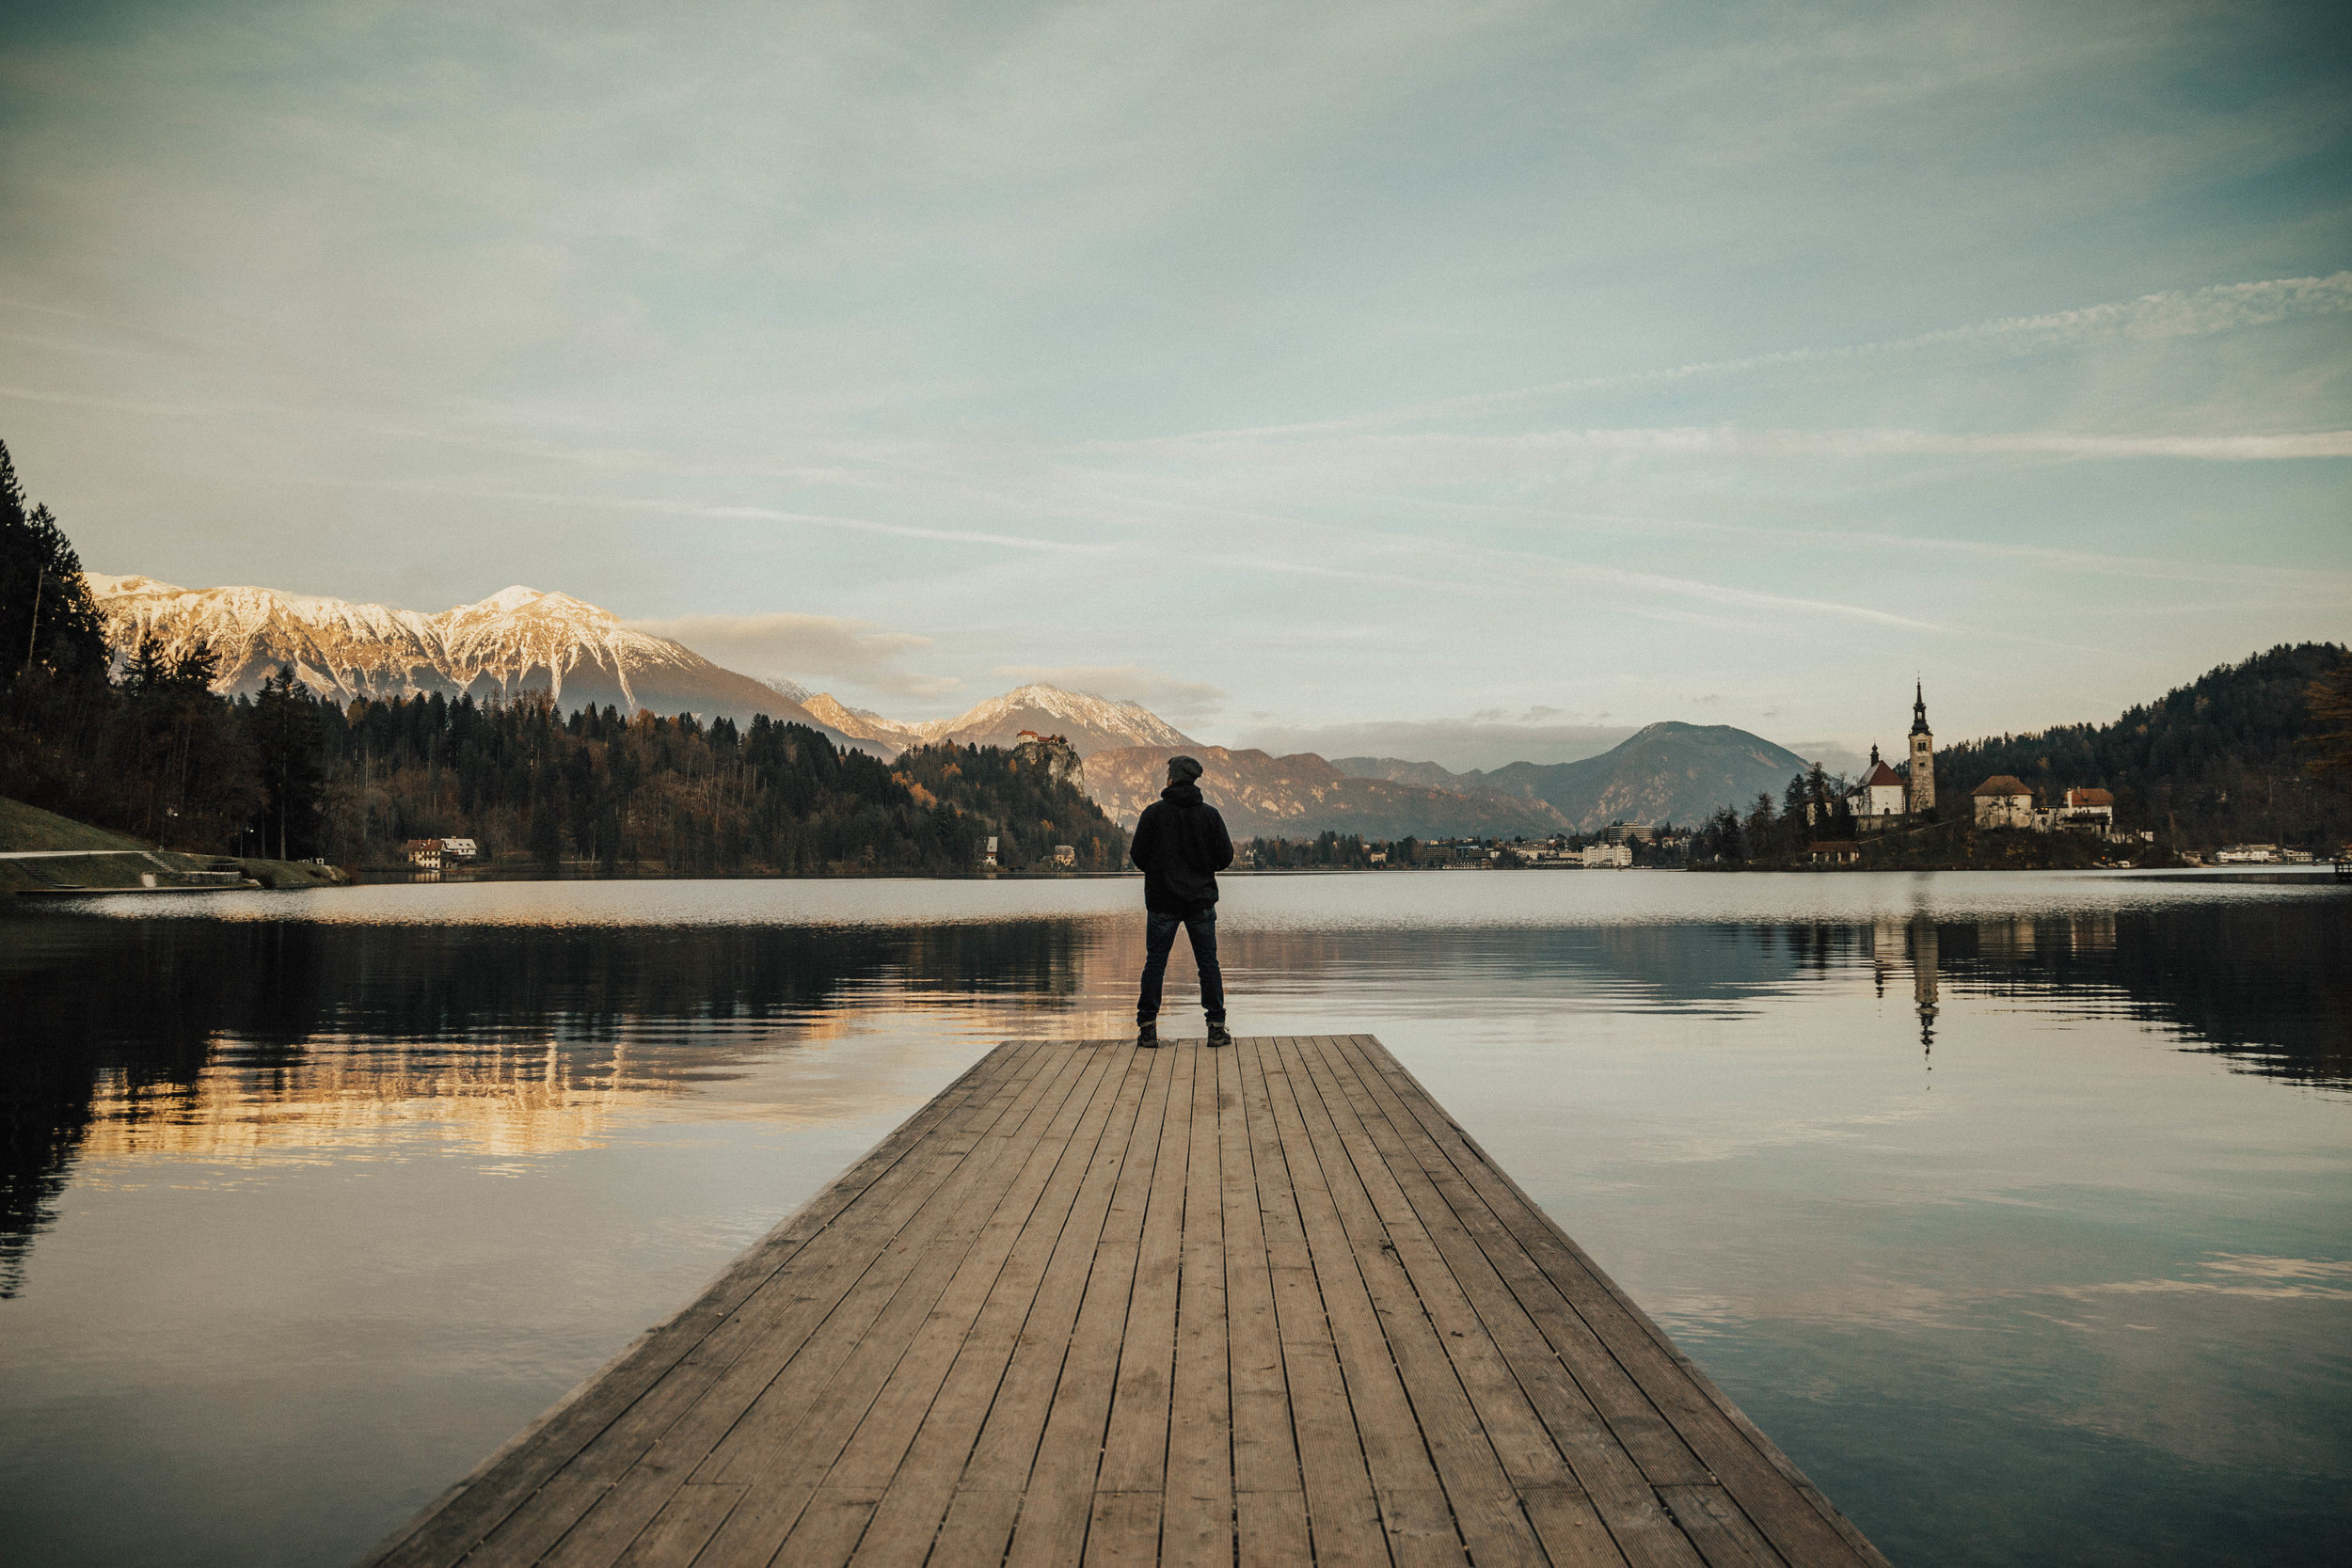 Ended back at Lake Bled for sunset